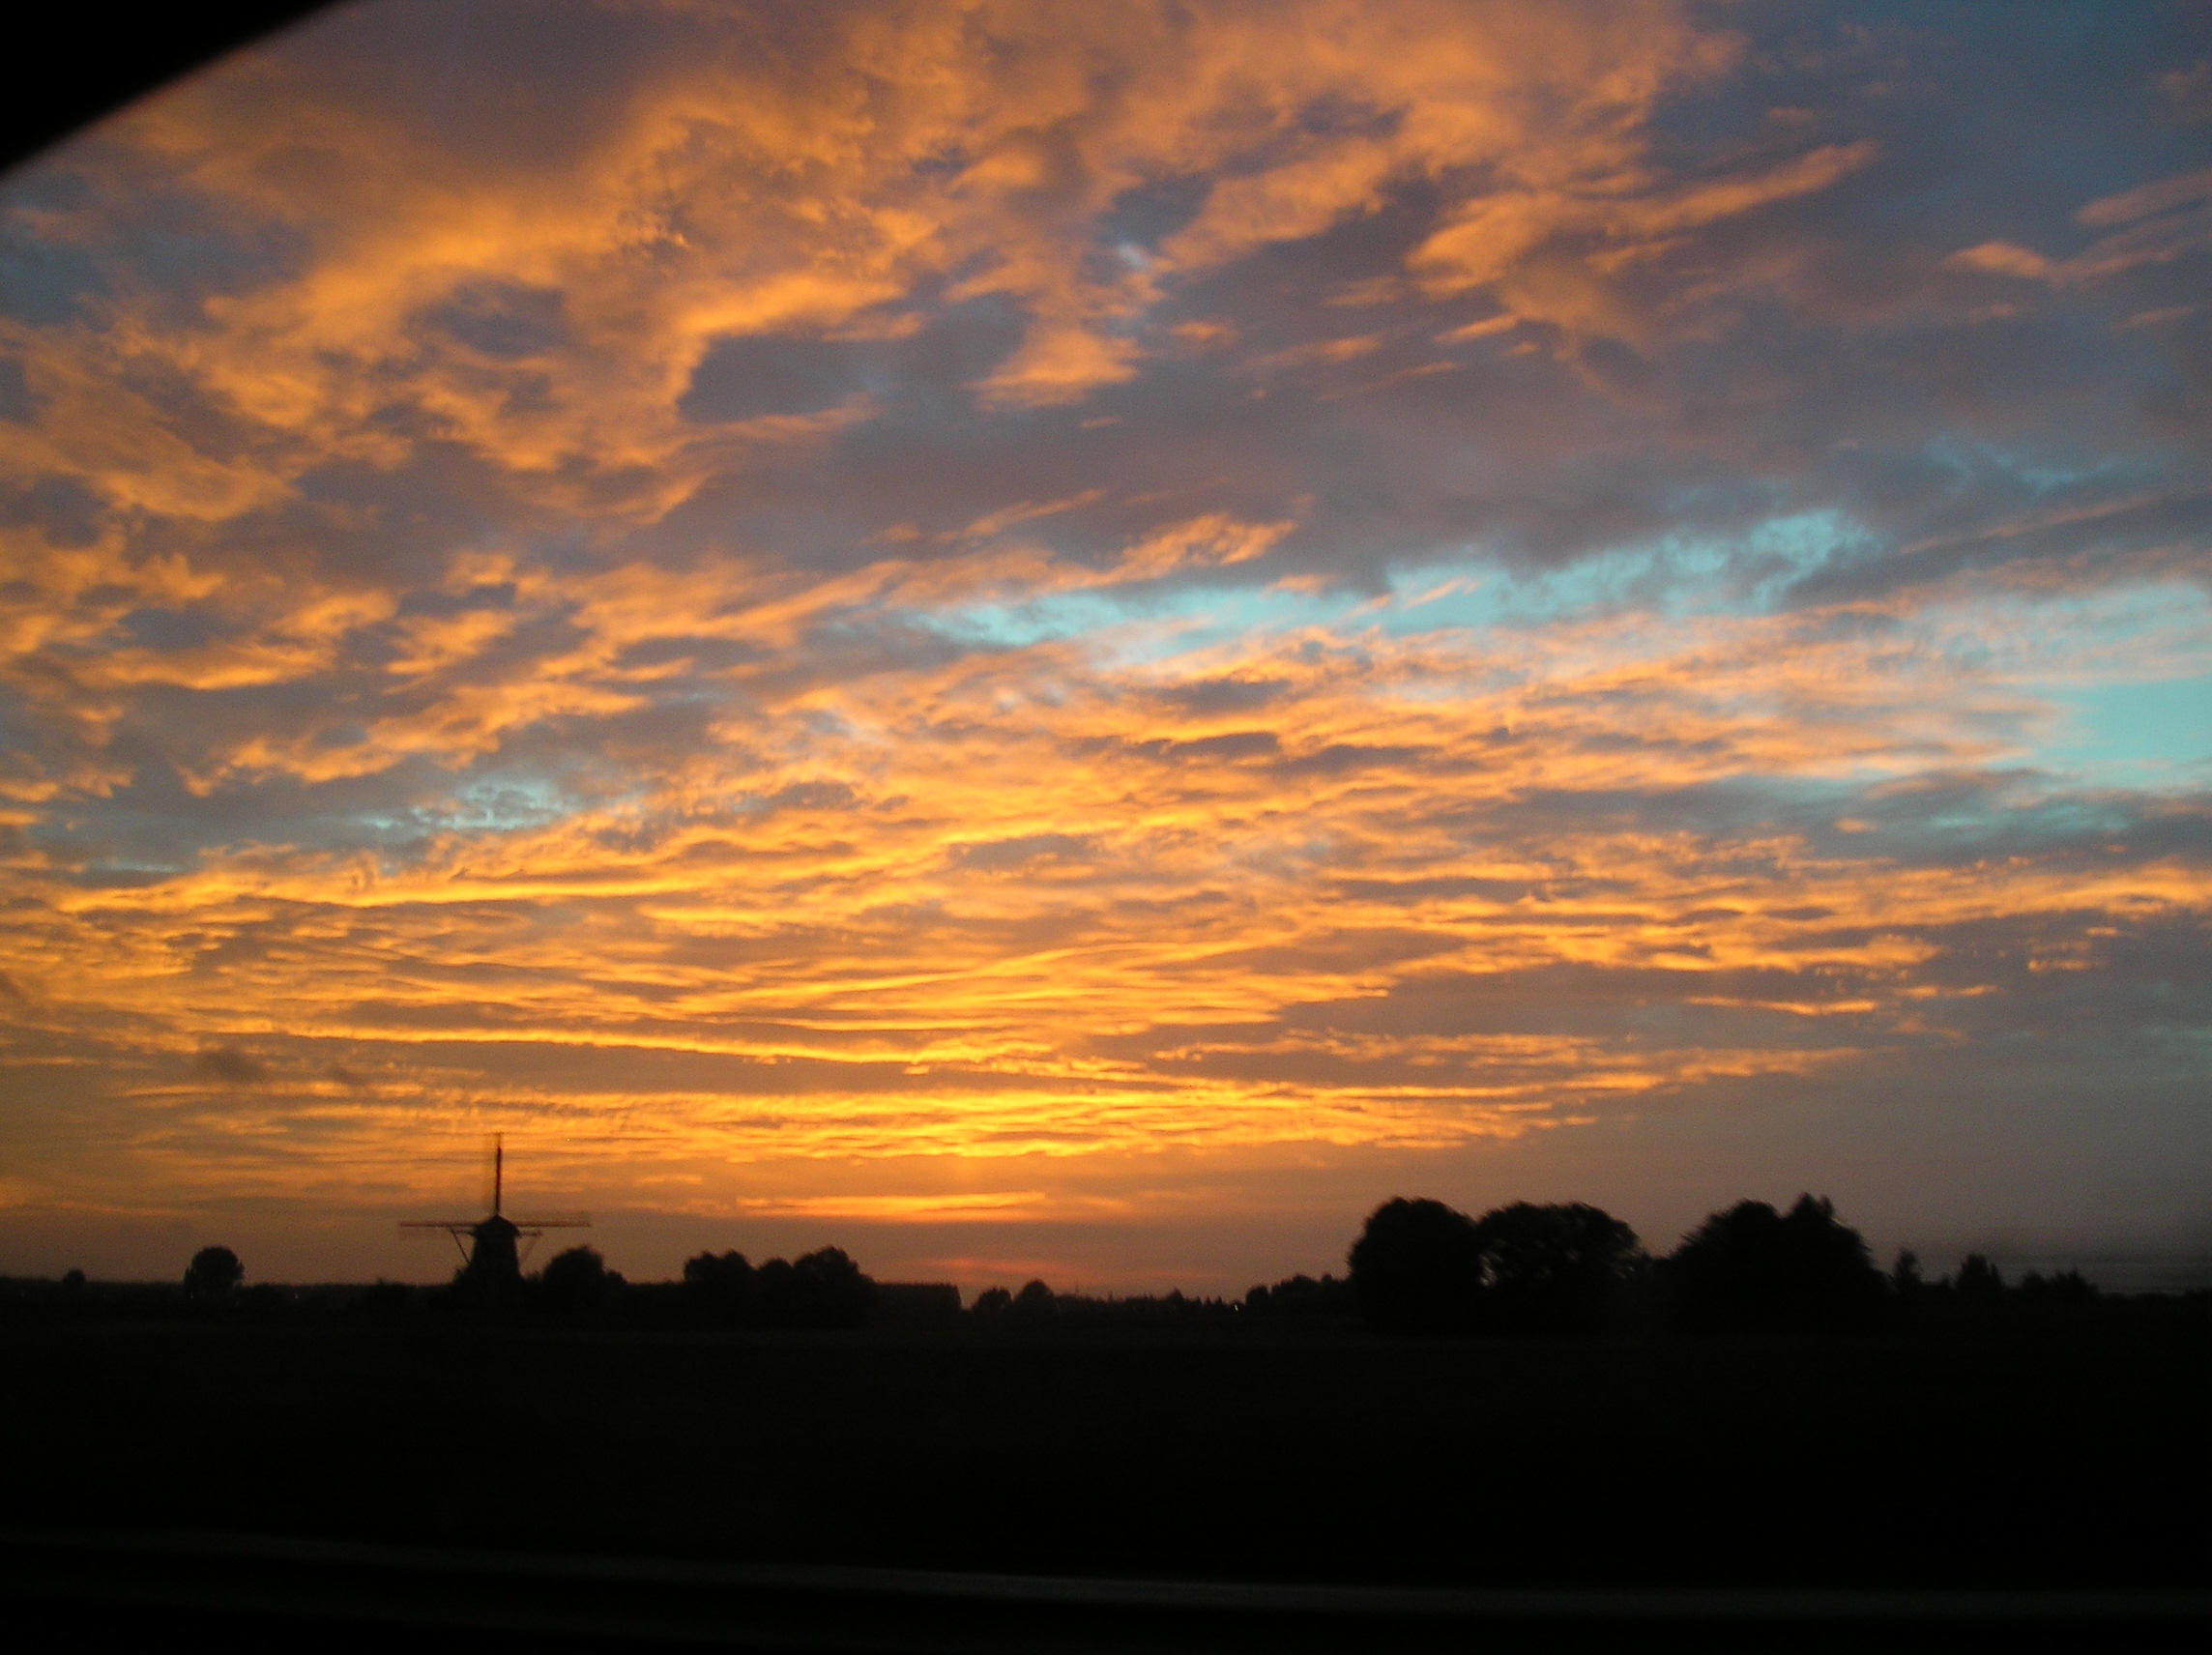 dutch skyline by ~Ann4a on